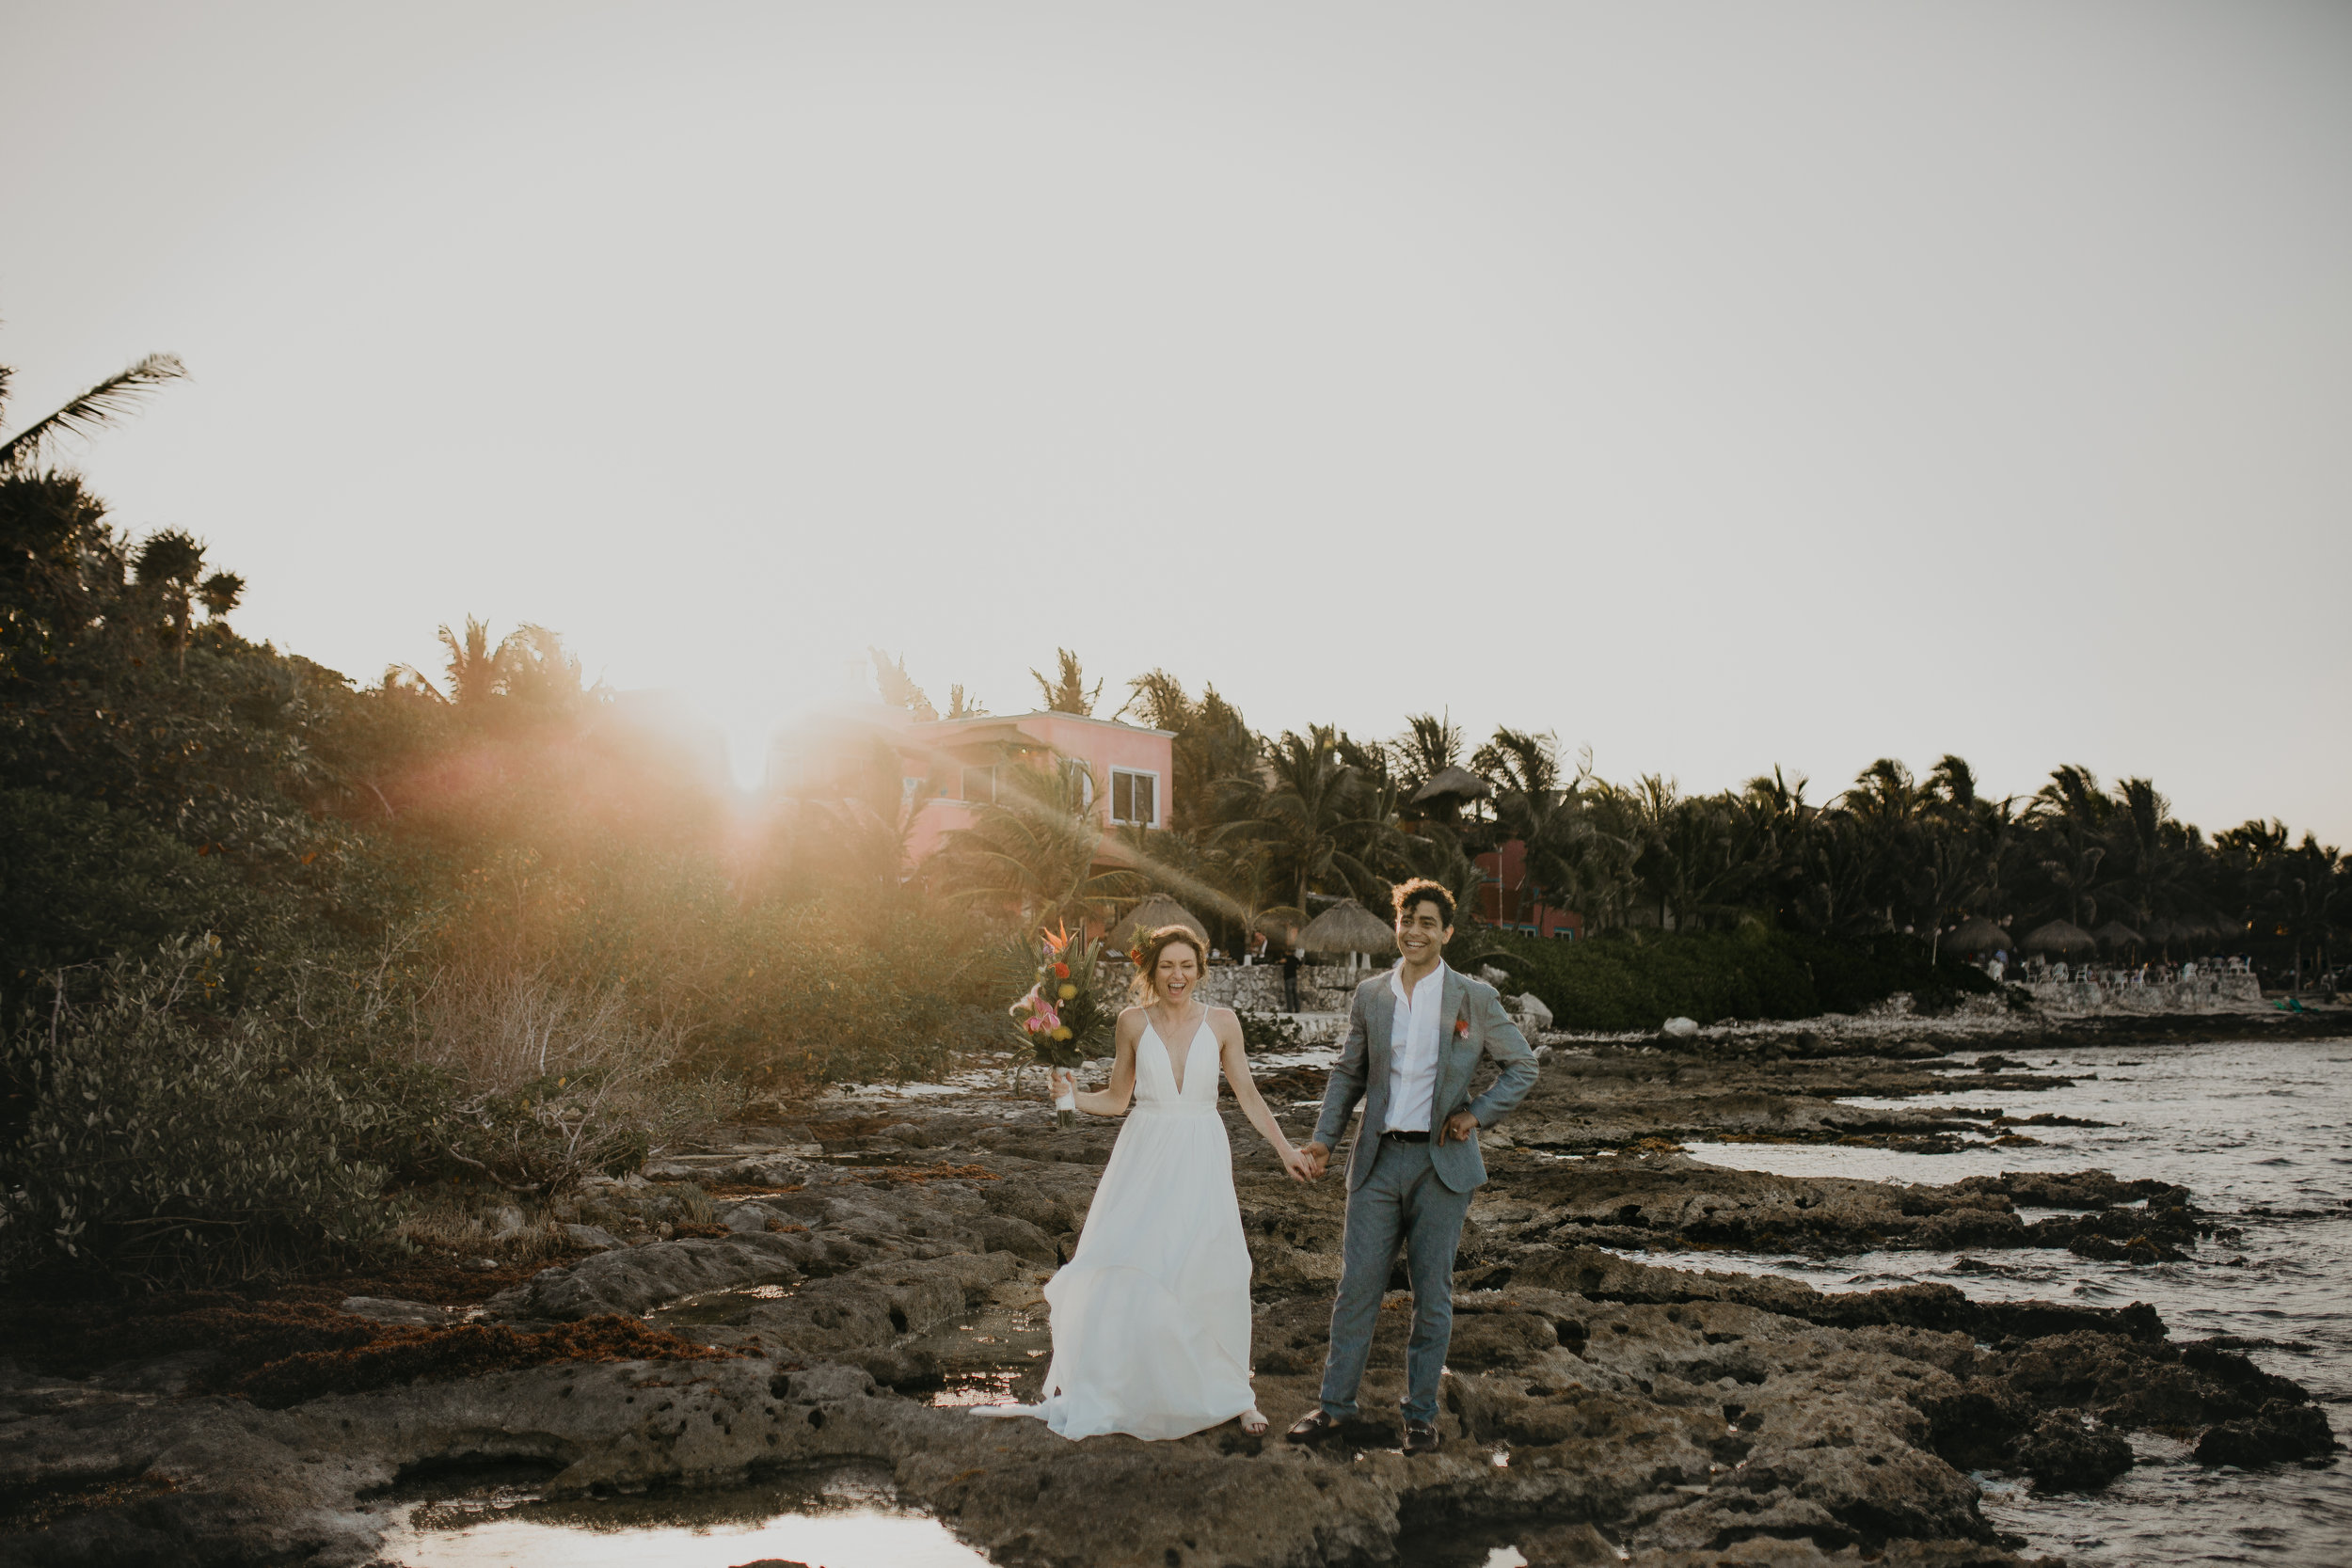 Nicole-Daacke-Photography-beachfront-akumal-destionation-wedding-tulum-mexico-elopement-photographer-destination-wedding-inspiration-sunset-champagne-pop-boho-bride-ocean-tropical-bohemian-tulum-wedding-photos-187.jpg